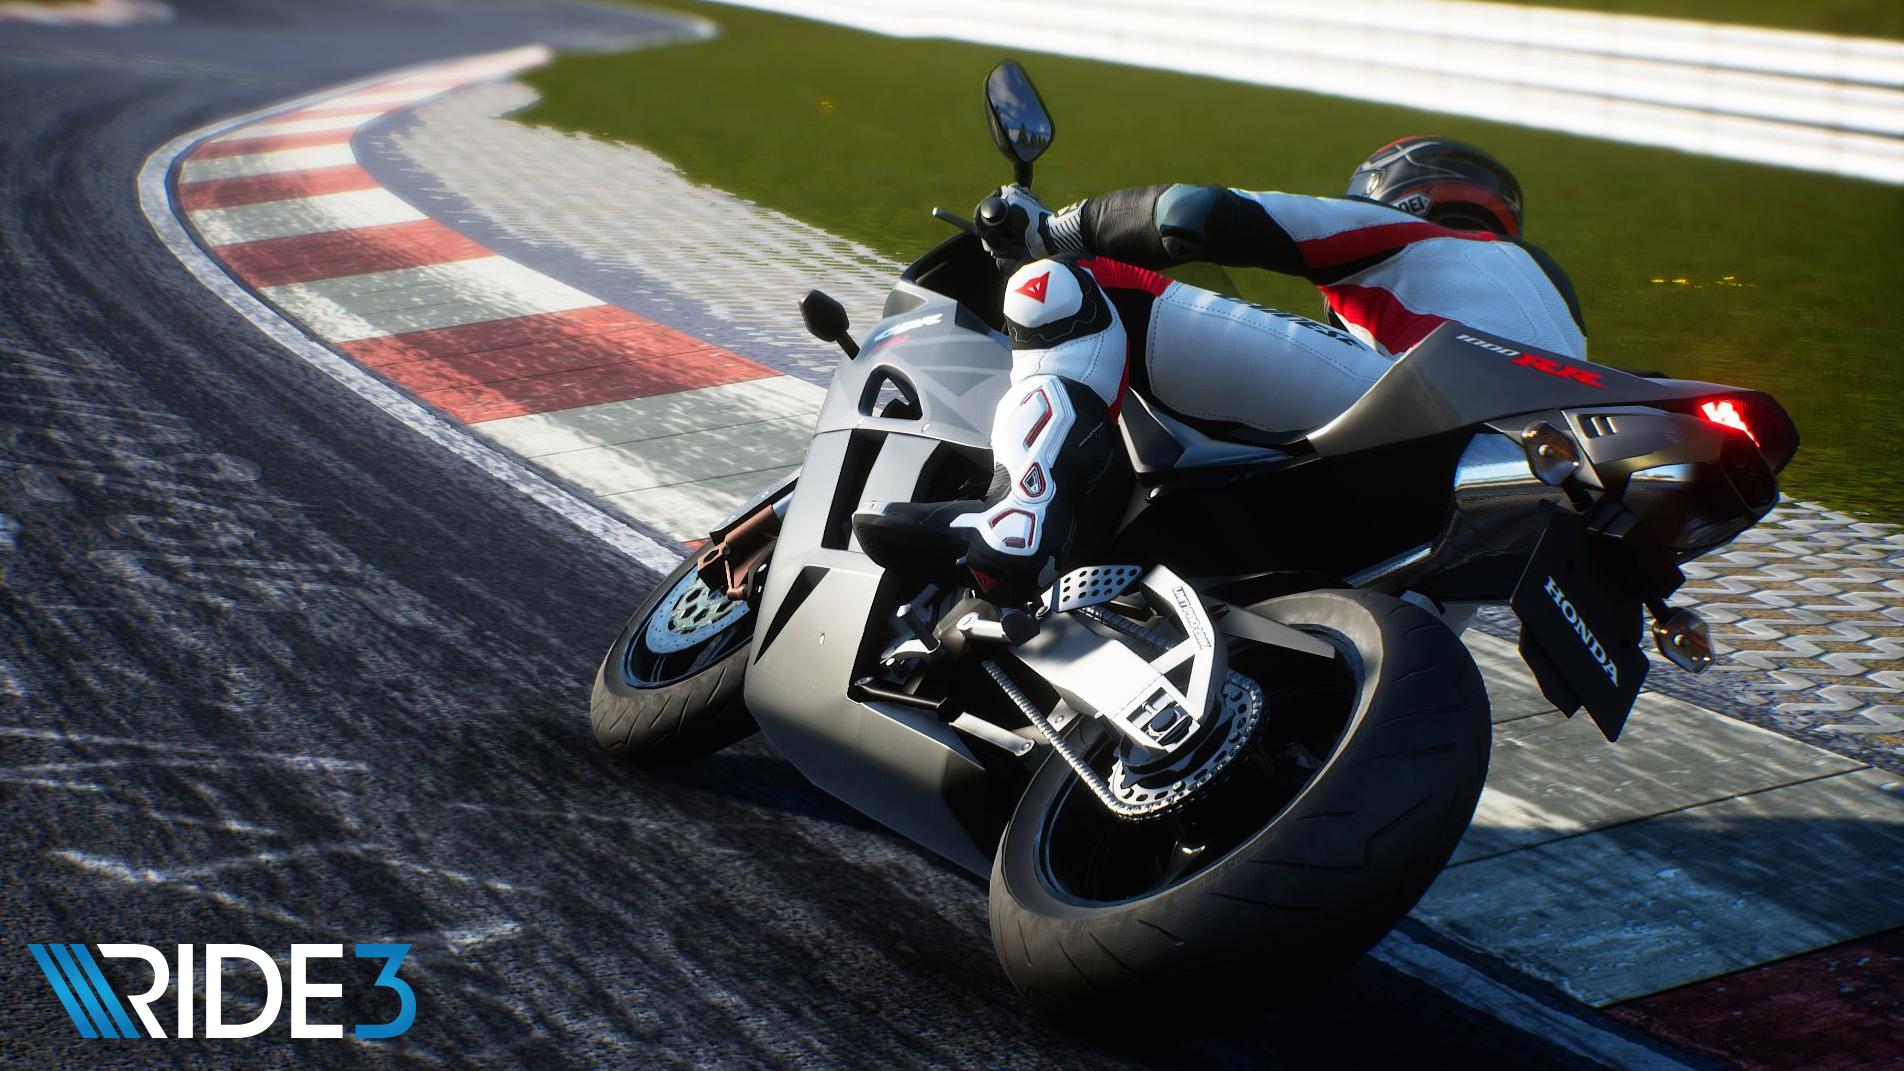 Ride 3 liste des motos5